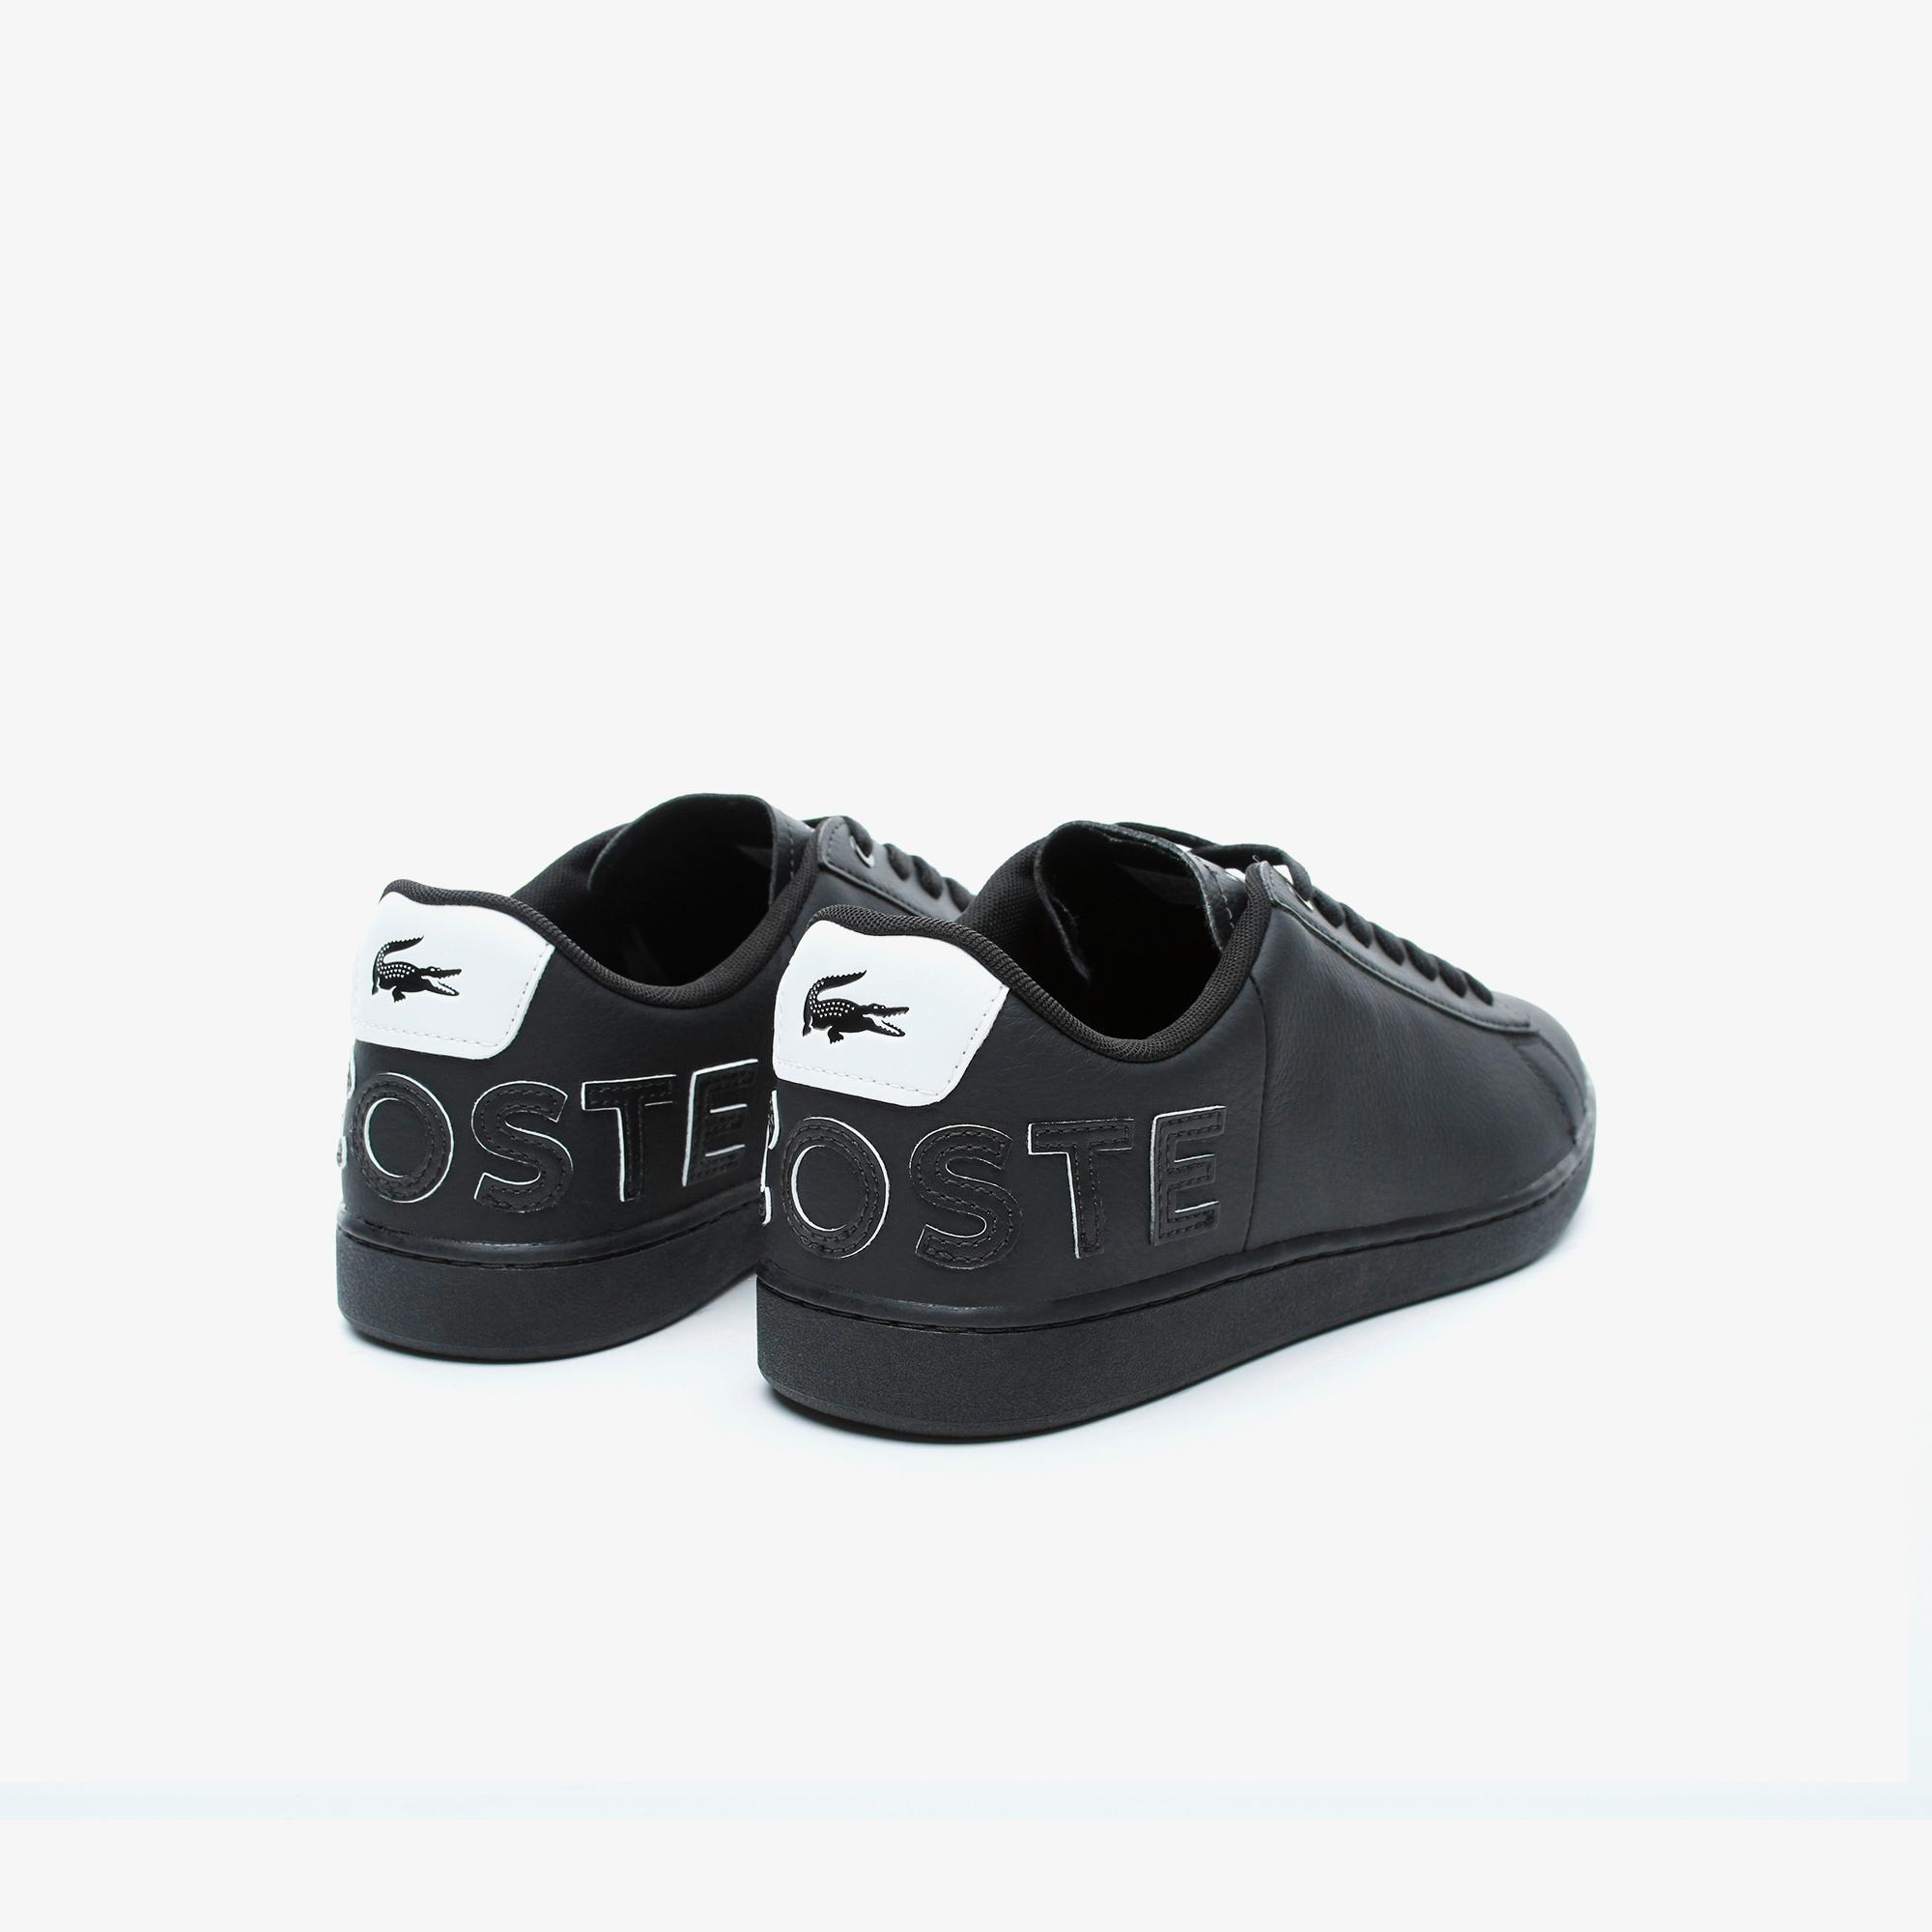 Lacoste Carnaby Evo 120 7 Us Sma Erkek Siyah Deri Sneaker